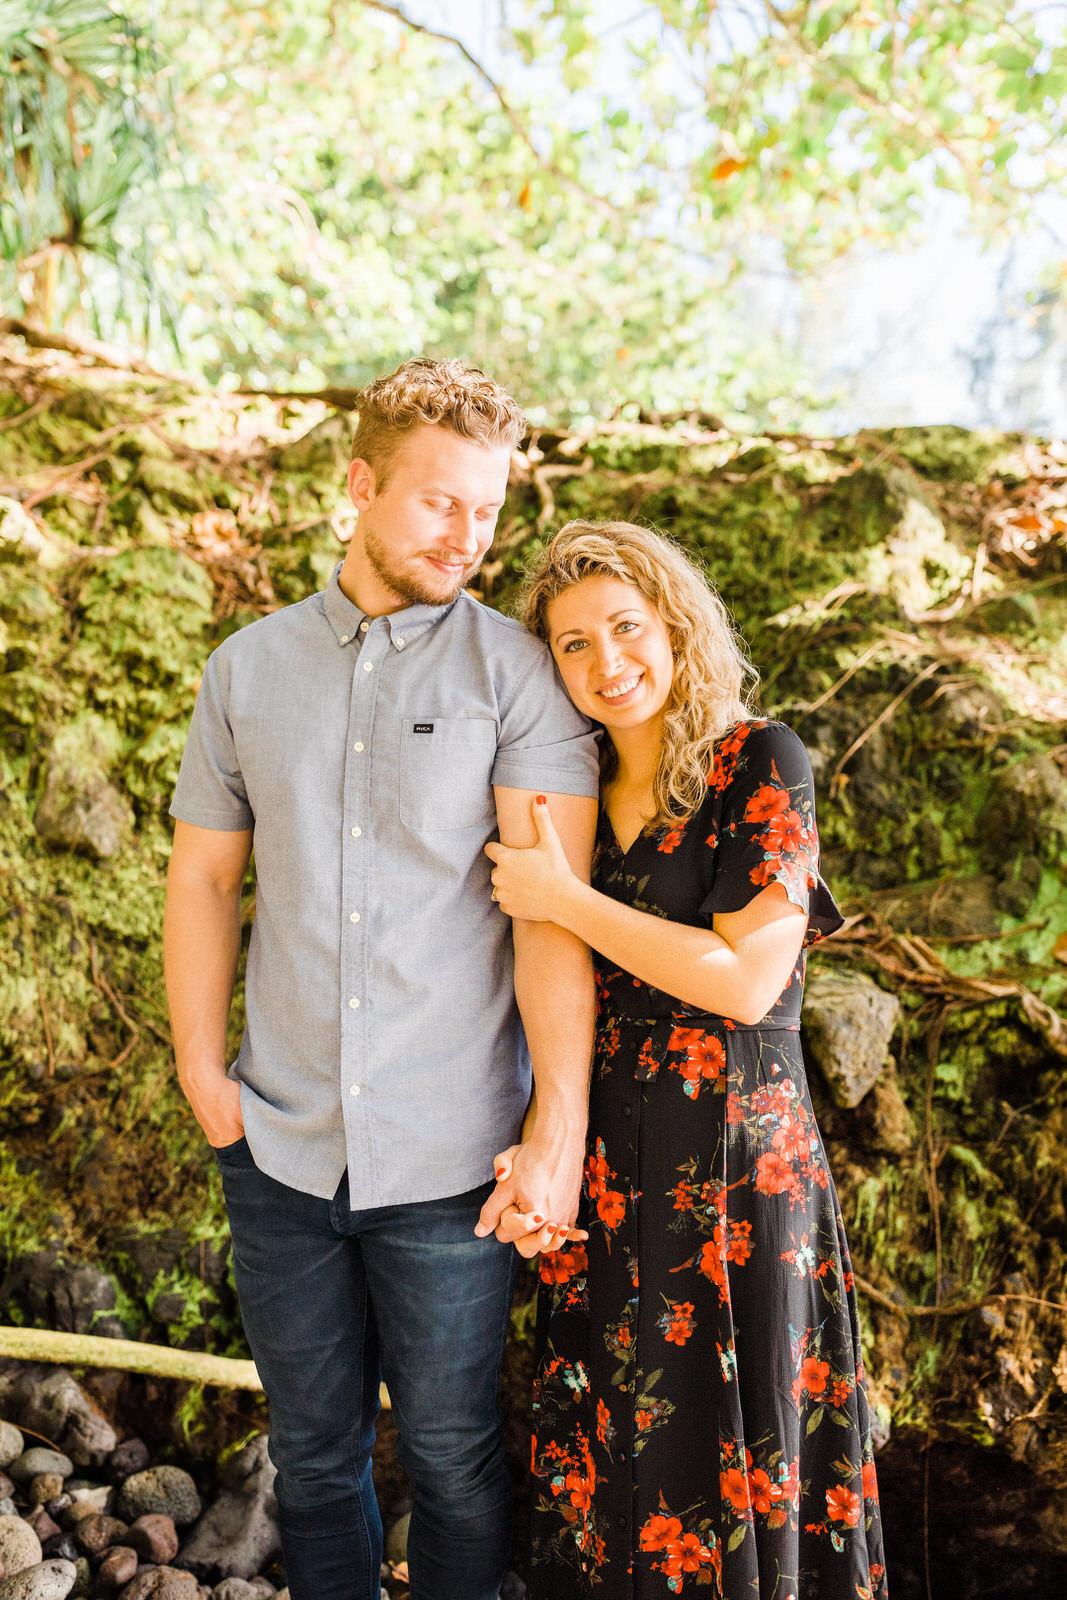 engagements-hilo-happy-couple-big-island-hawaii-20.jpg